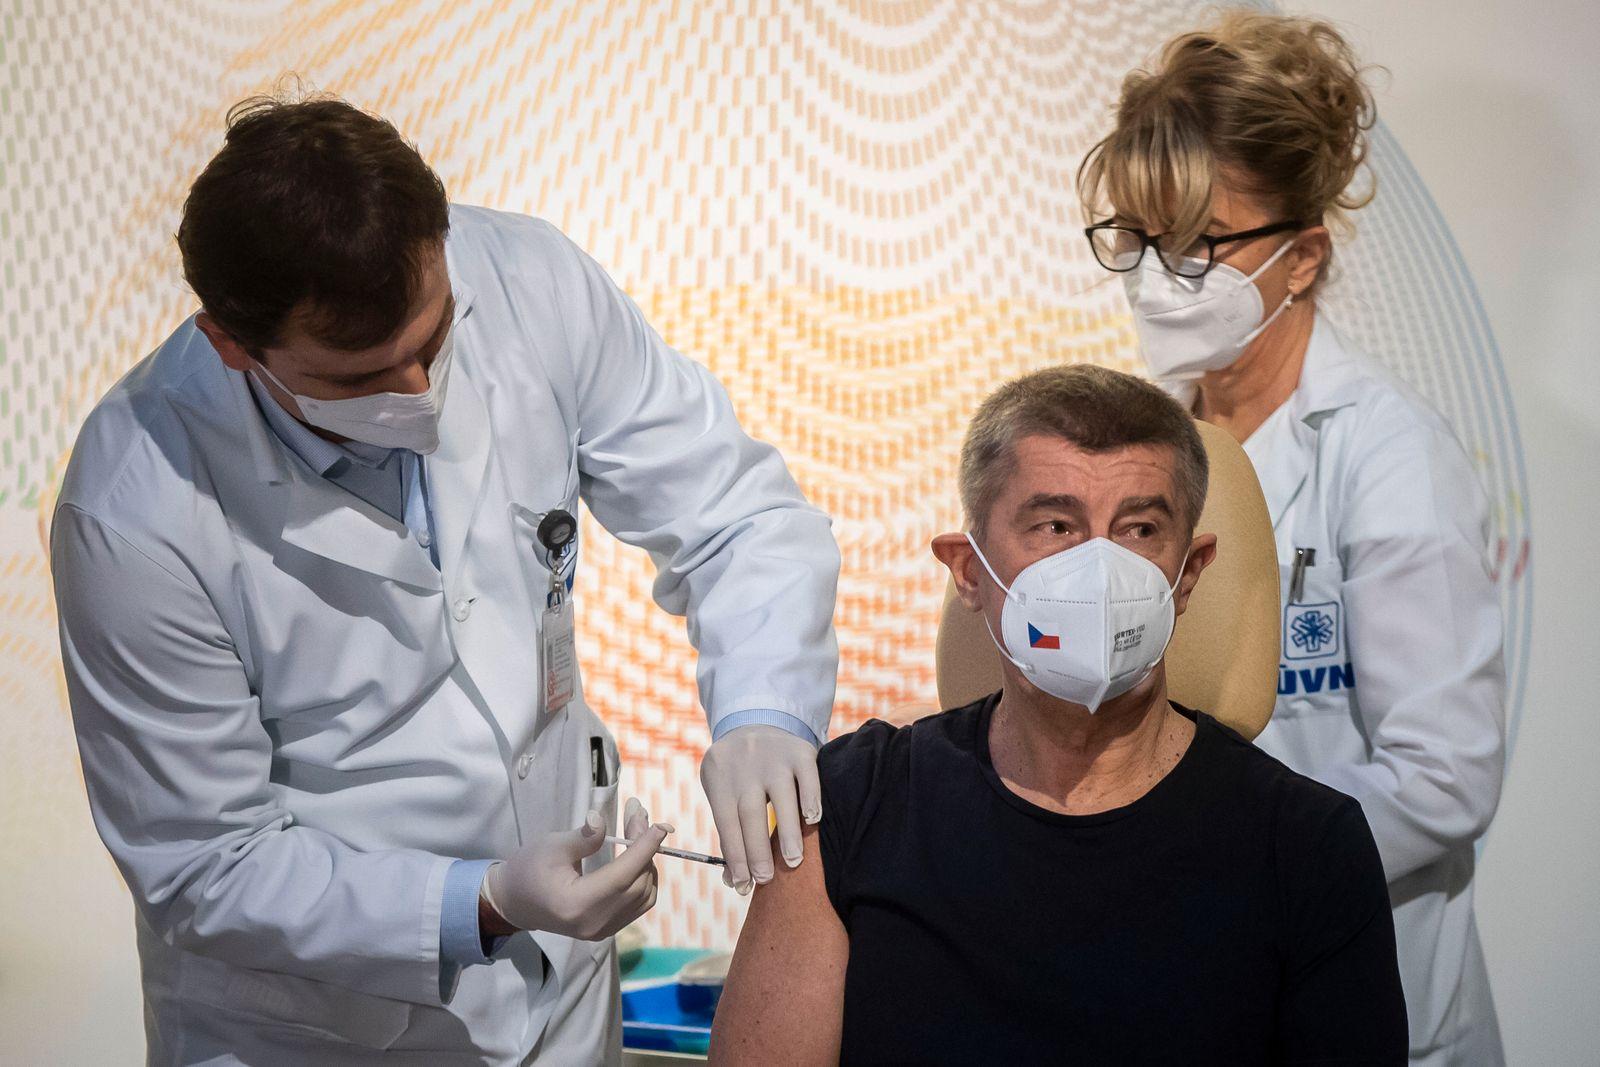 Czech Republic Begins Rollout of Covid-19 Vaccine